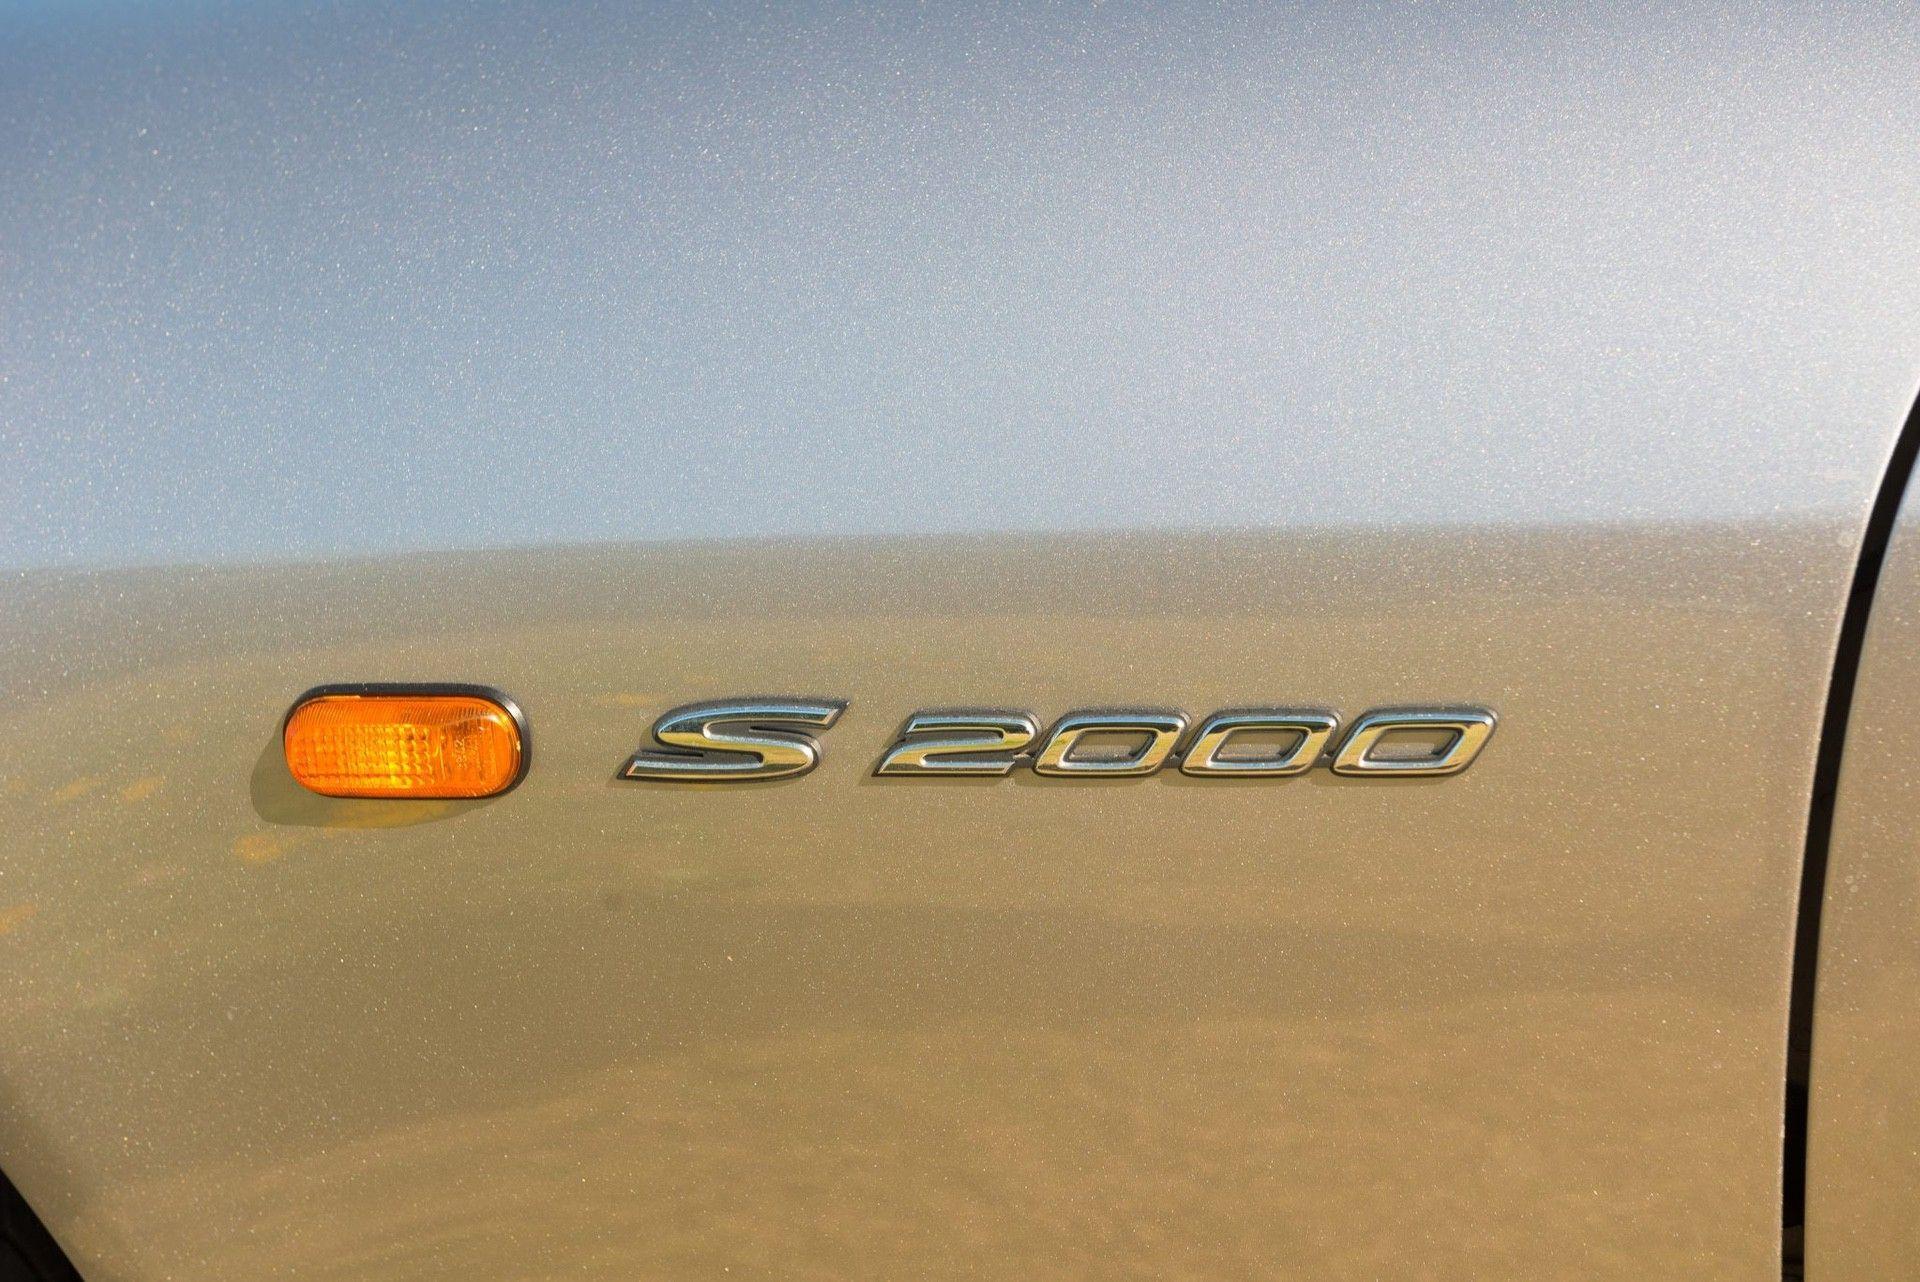 2000_Honda_S2000_auction-0000